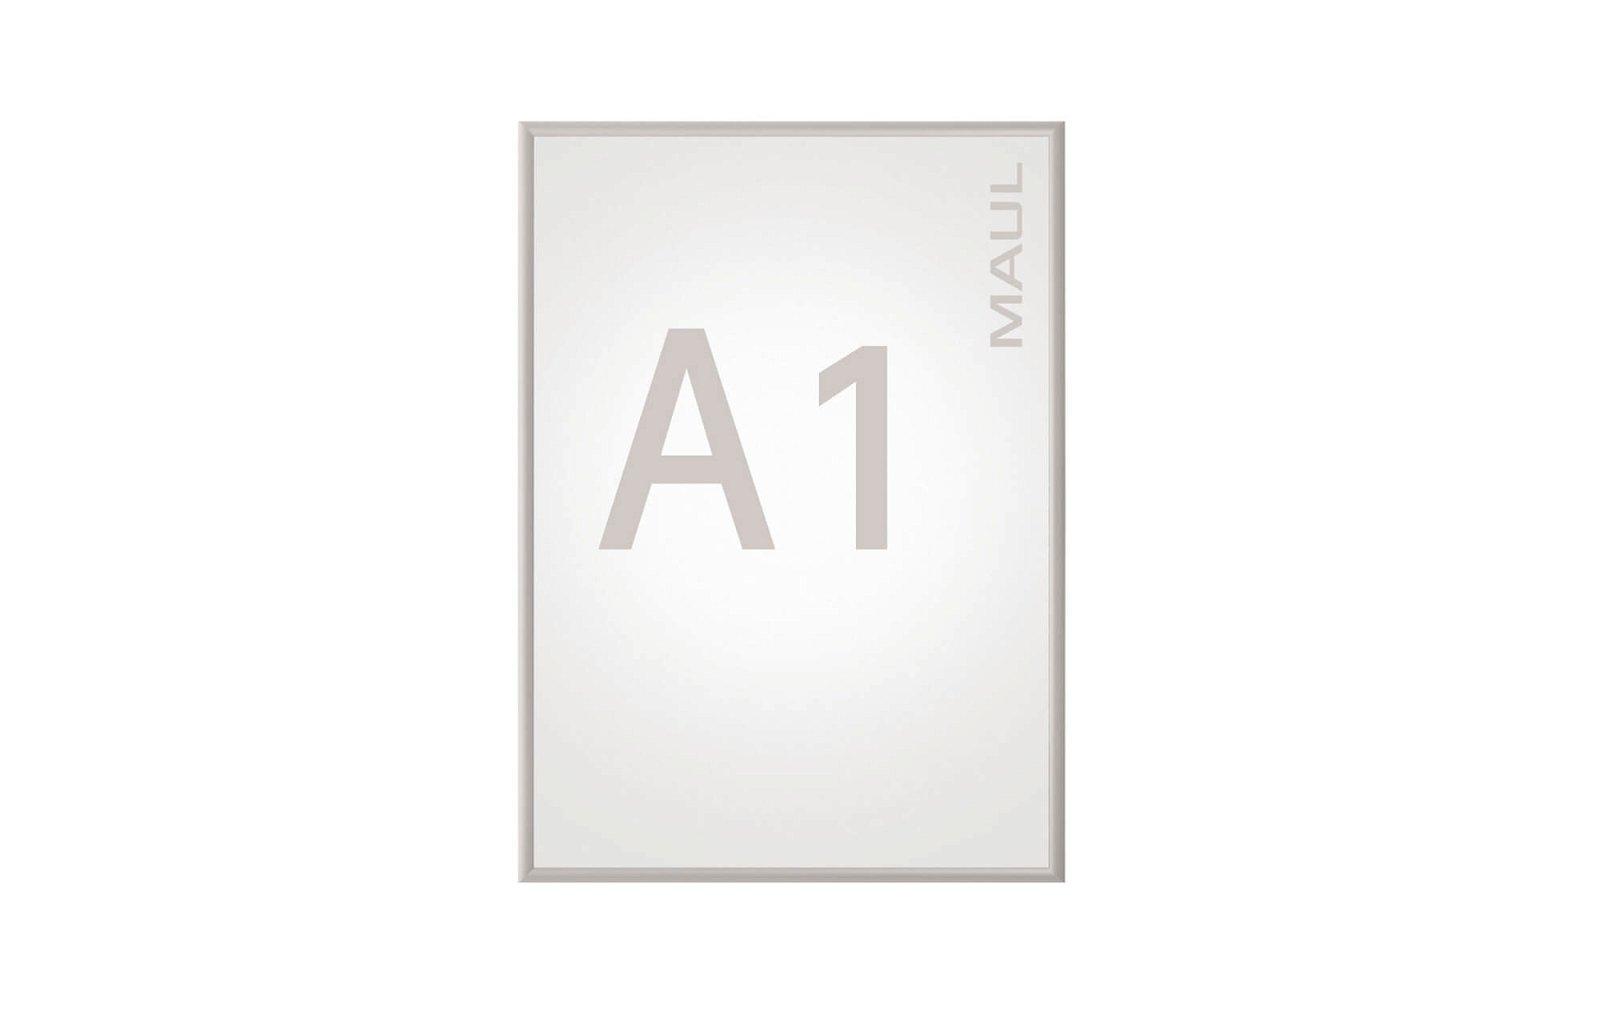 Klapprahmen MAULstandard, A1, aluminium